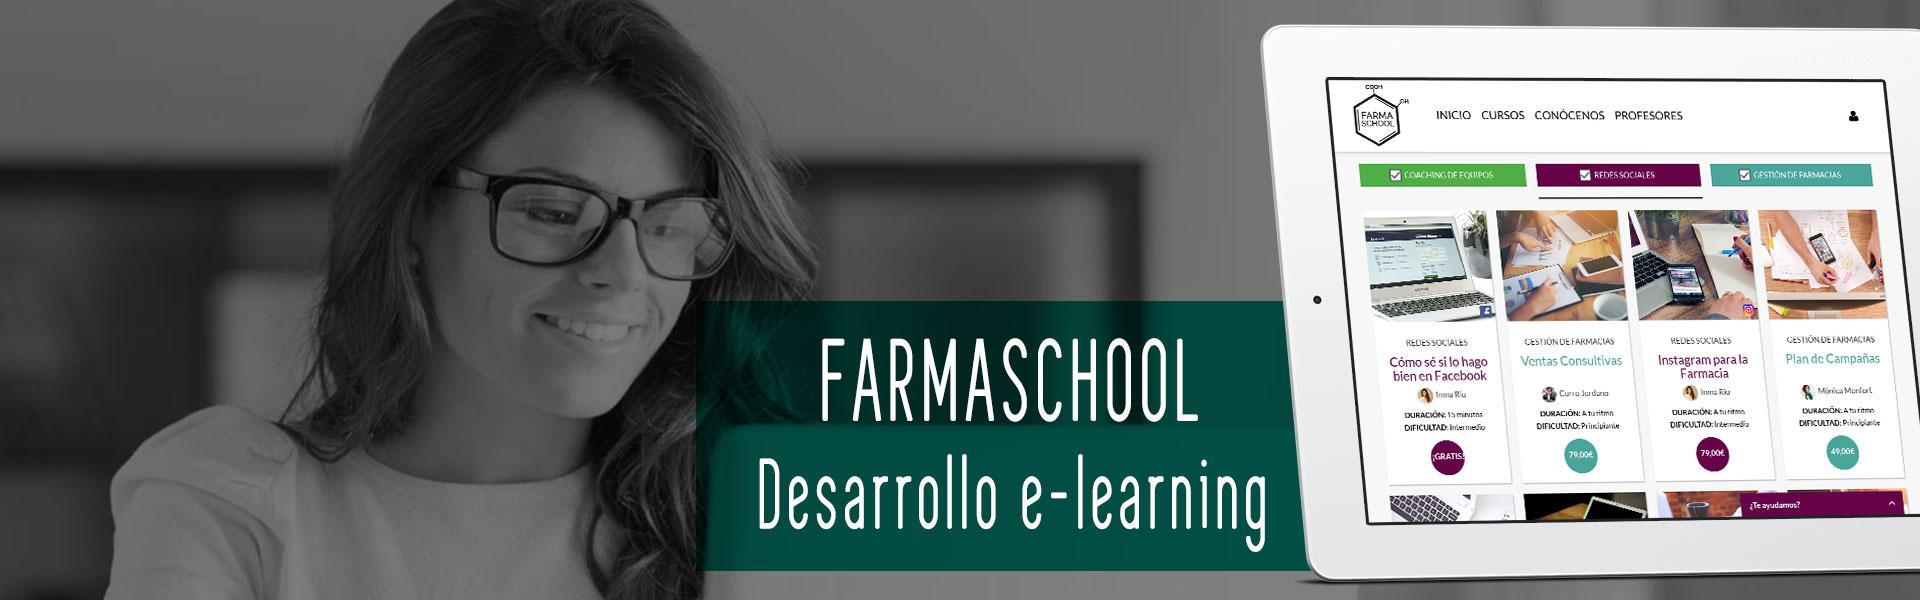 Farmaschool